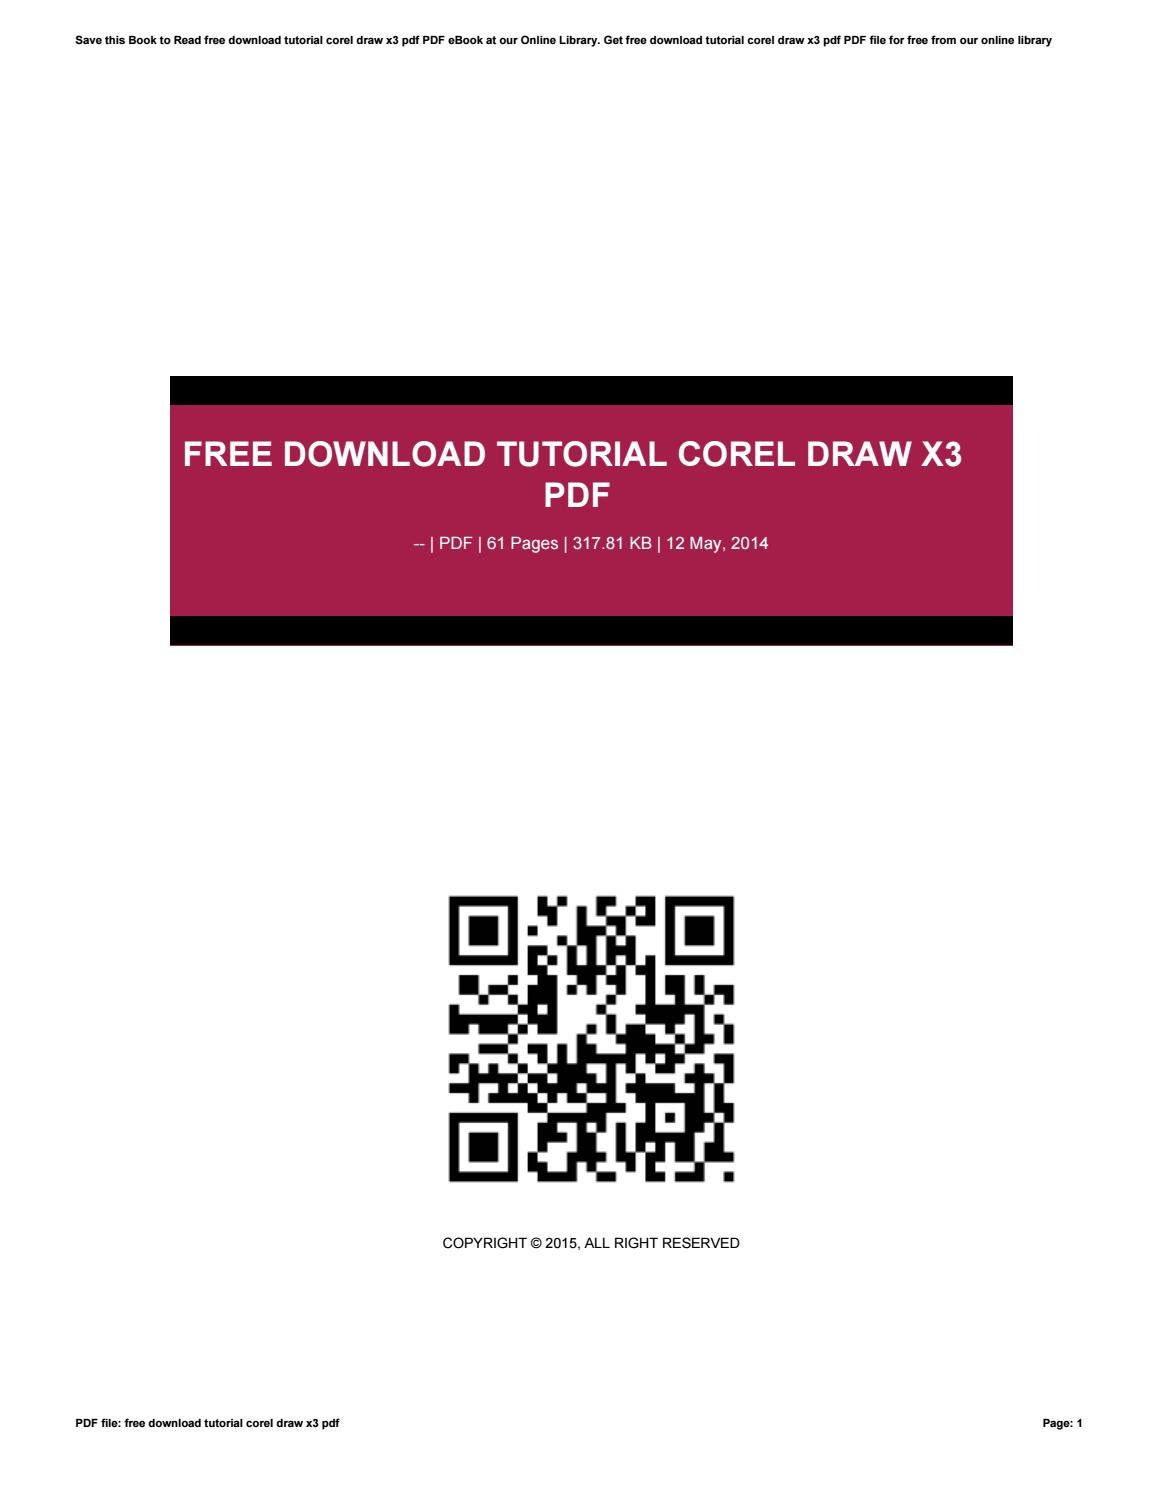 Free download tutorial corel draw x3 pdf by tantie43kristina - issuu